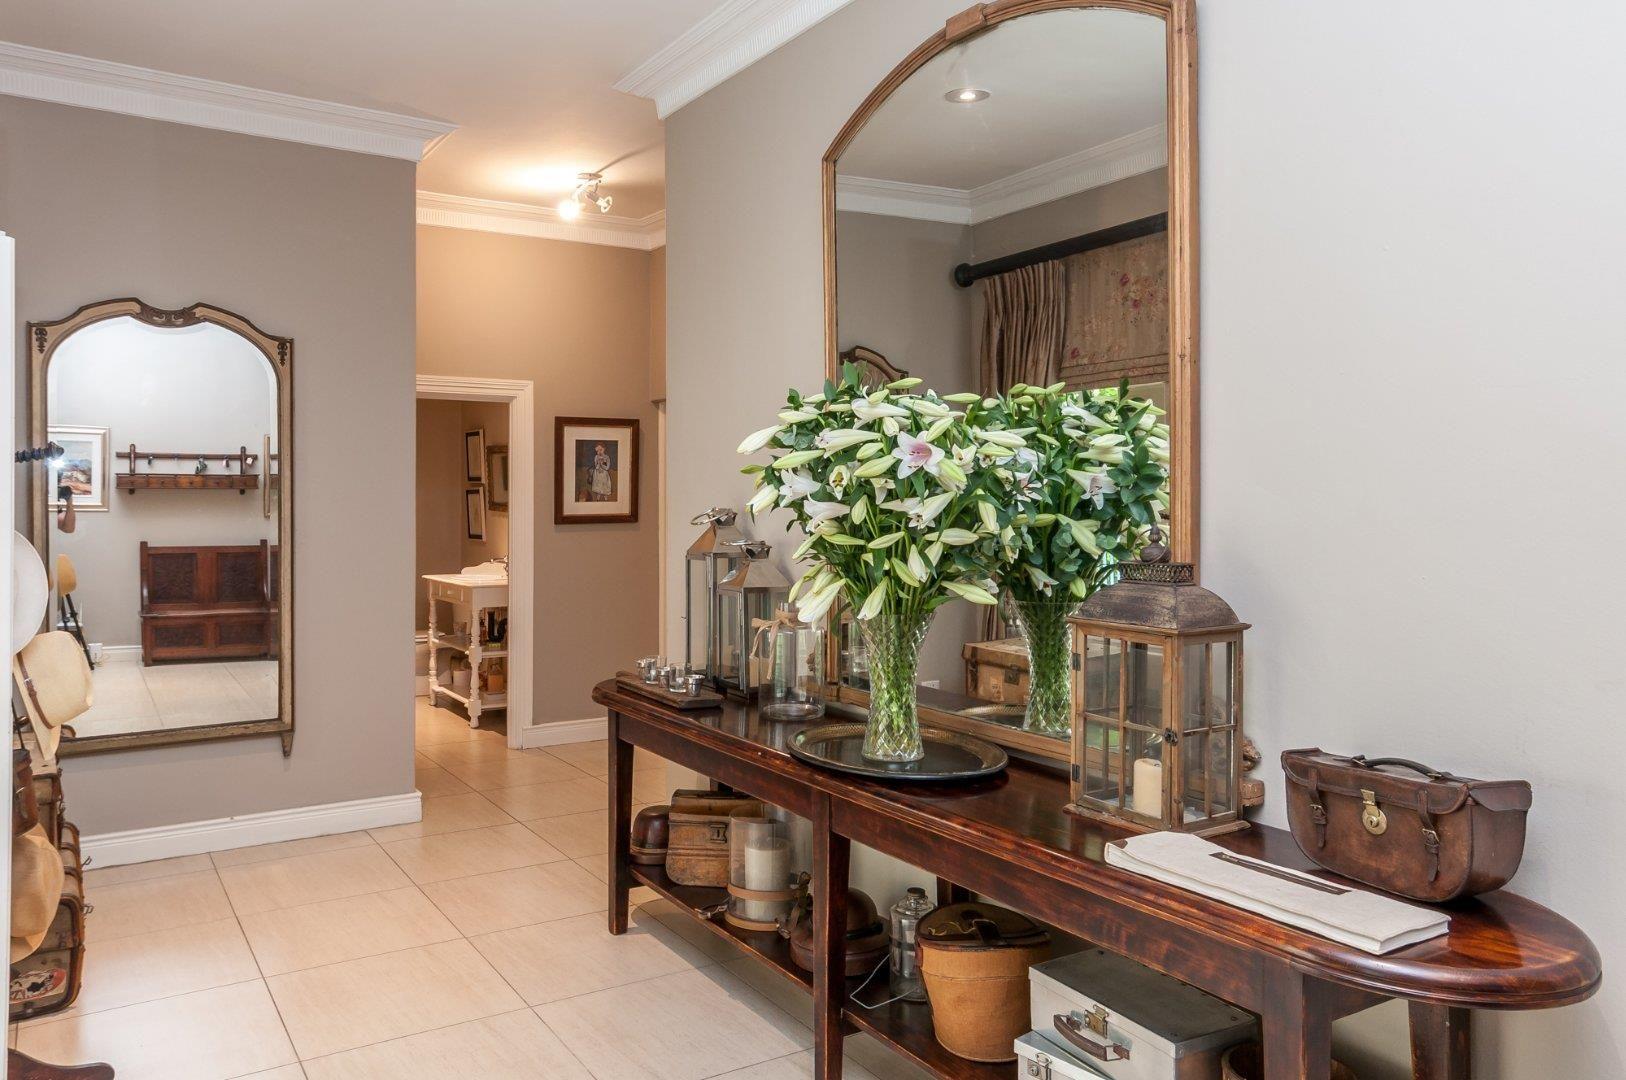 5 bedroom house for sale in morningside p24106068644